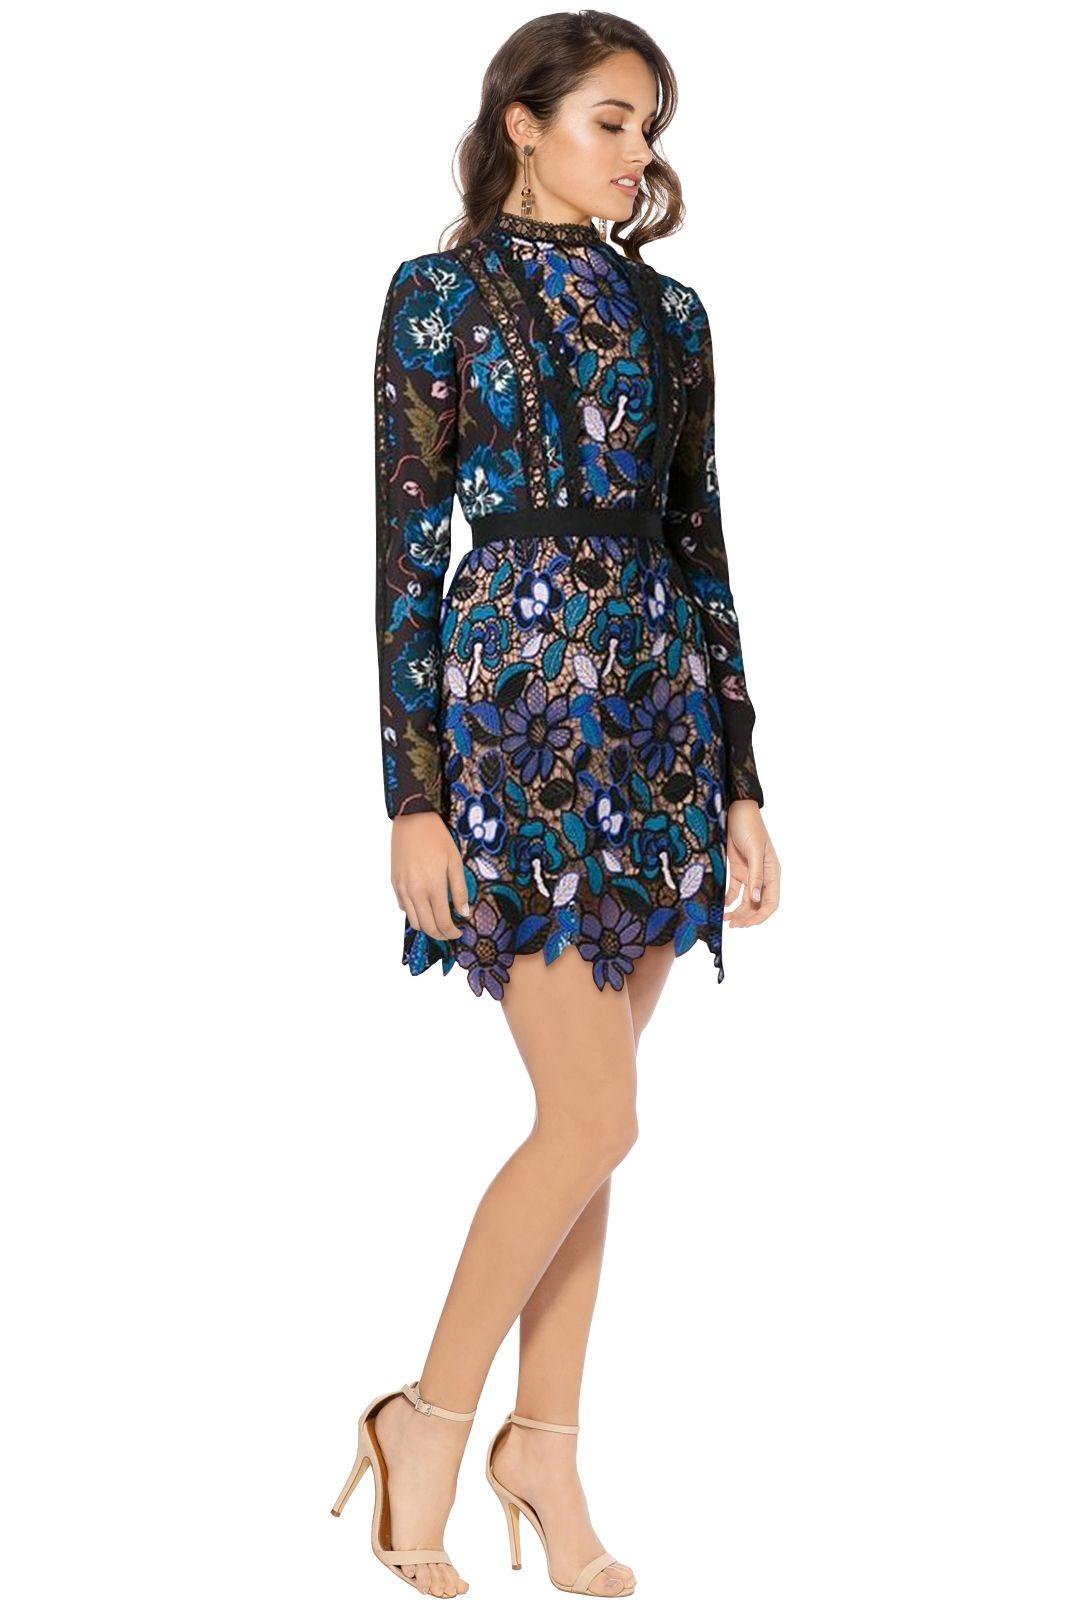 Self Portrait - Maxine Mini Dress - Blue - Side